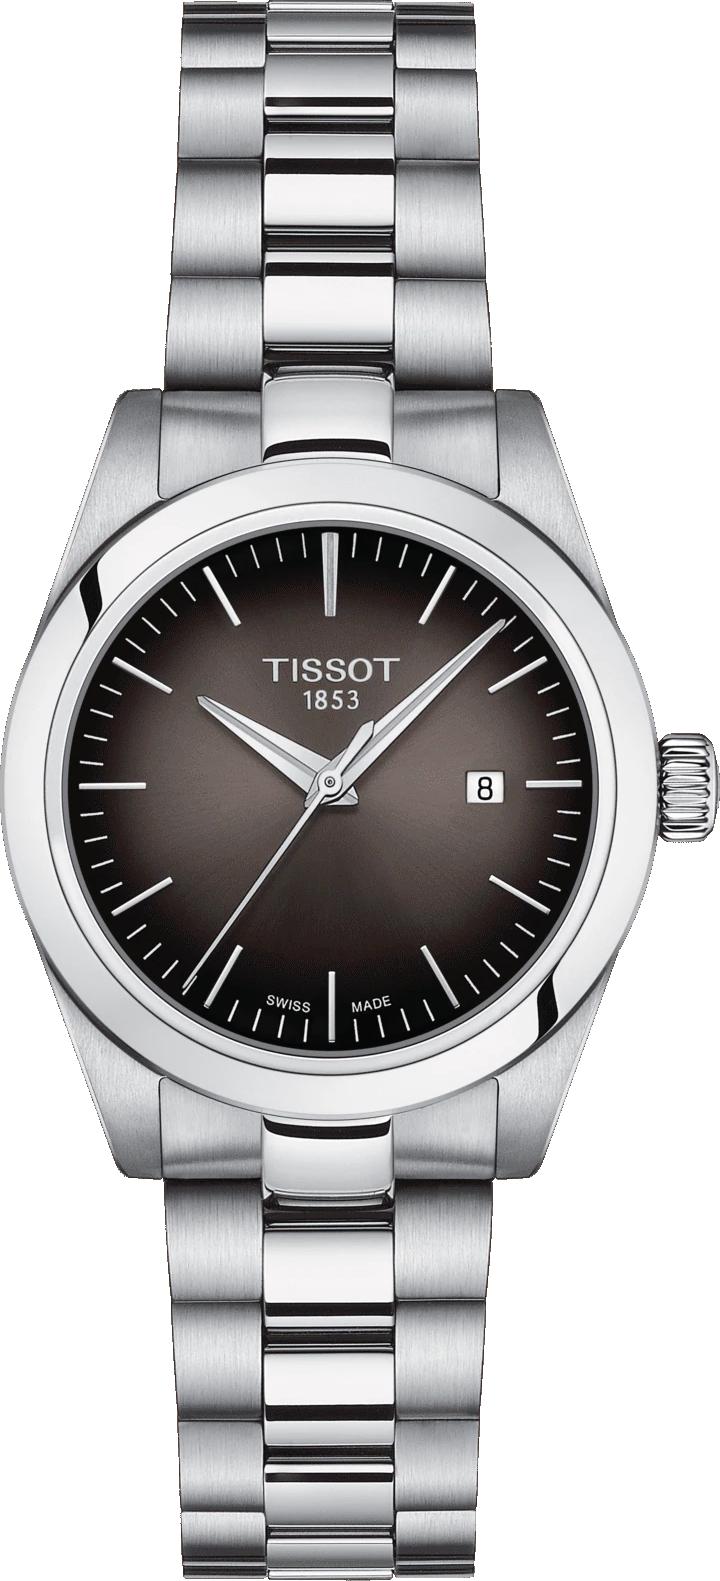 Tissot T132.010.11.061.00